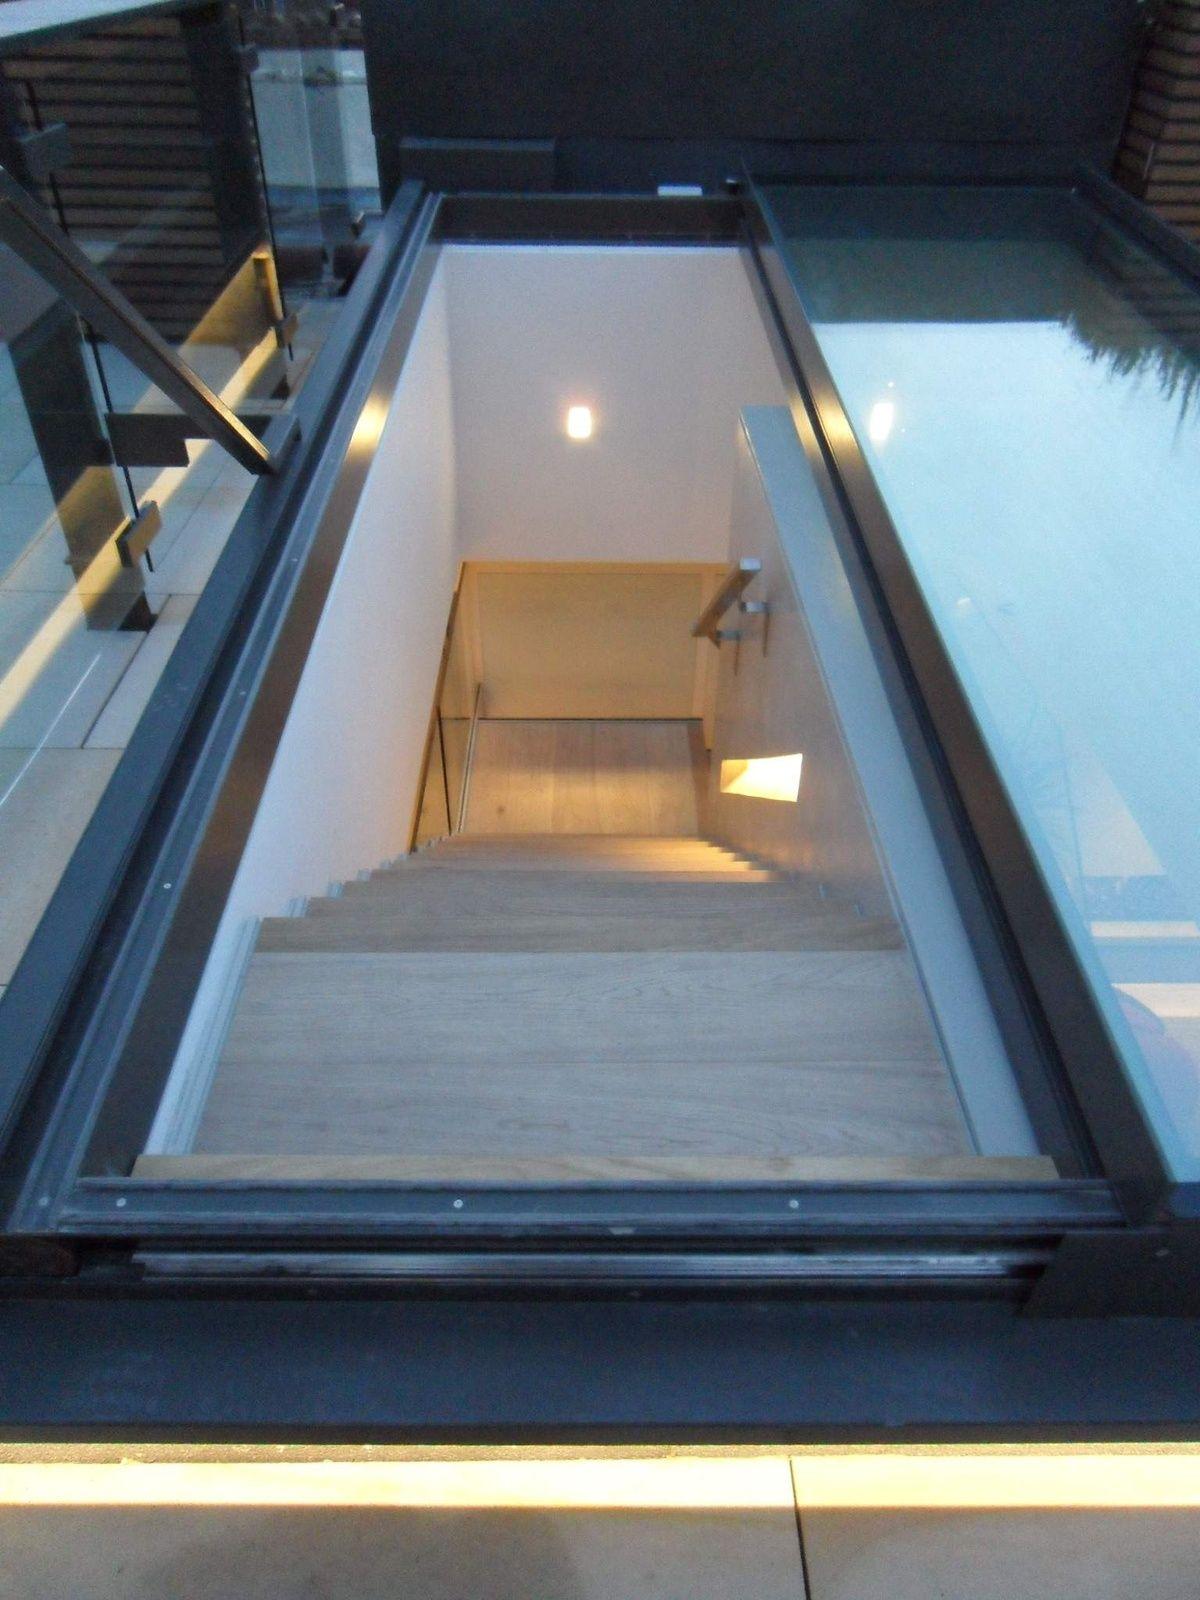 Cantifix Product Slideglaze Sliding Glass Roof Glass Roof Rooftop Design Roof Skylight